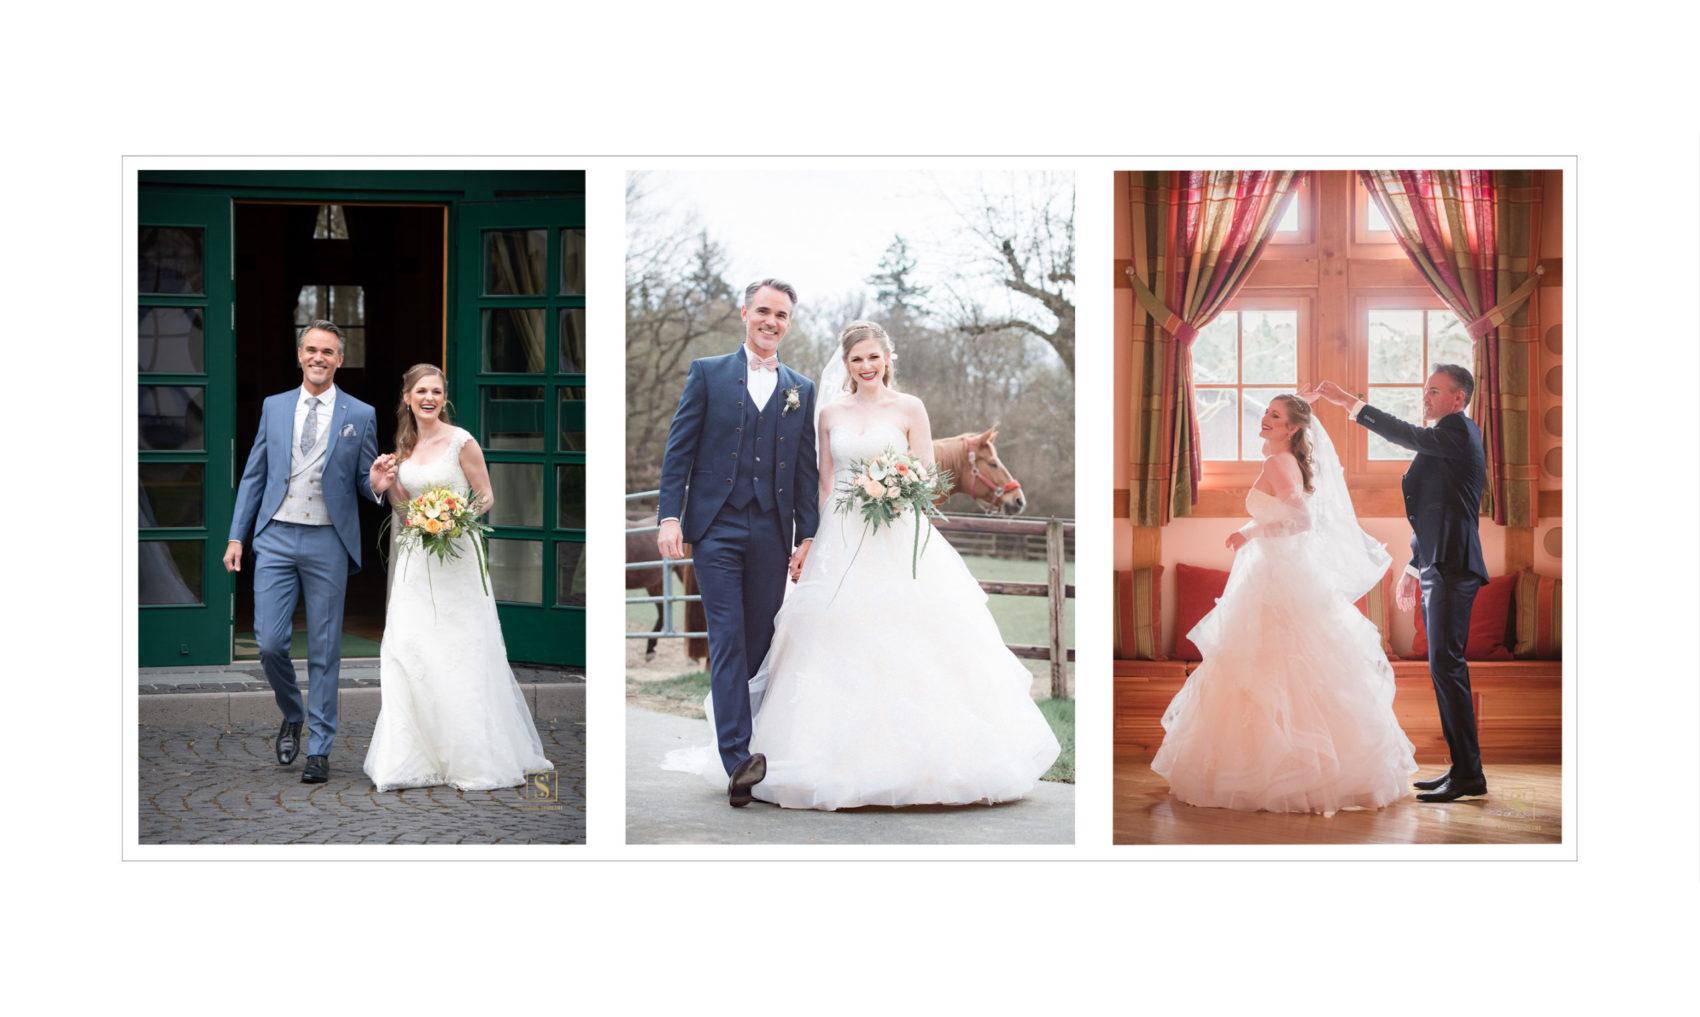 Hofgut-Mappen-Wedding-Hochzeitsfotograf-Saskia-Marloh-Photography-Johannisberg-Abu-Dhabi-2